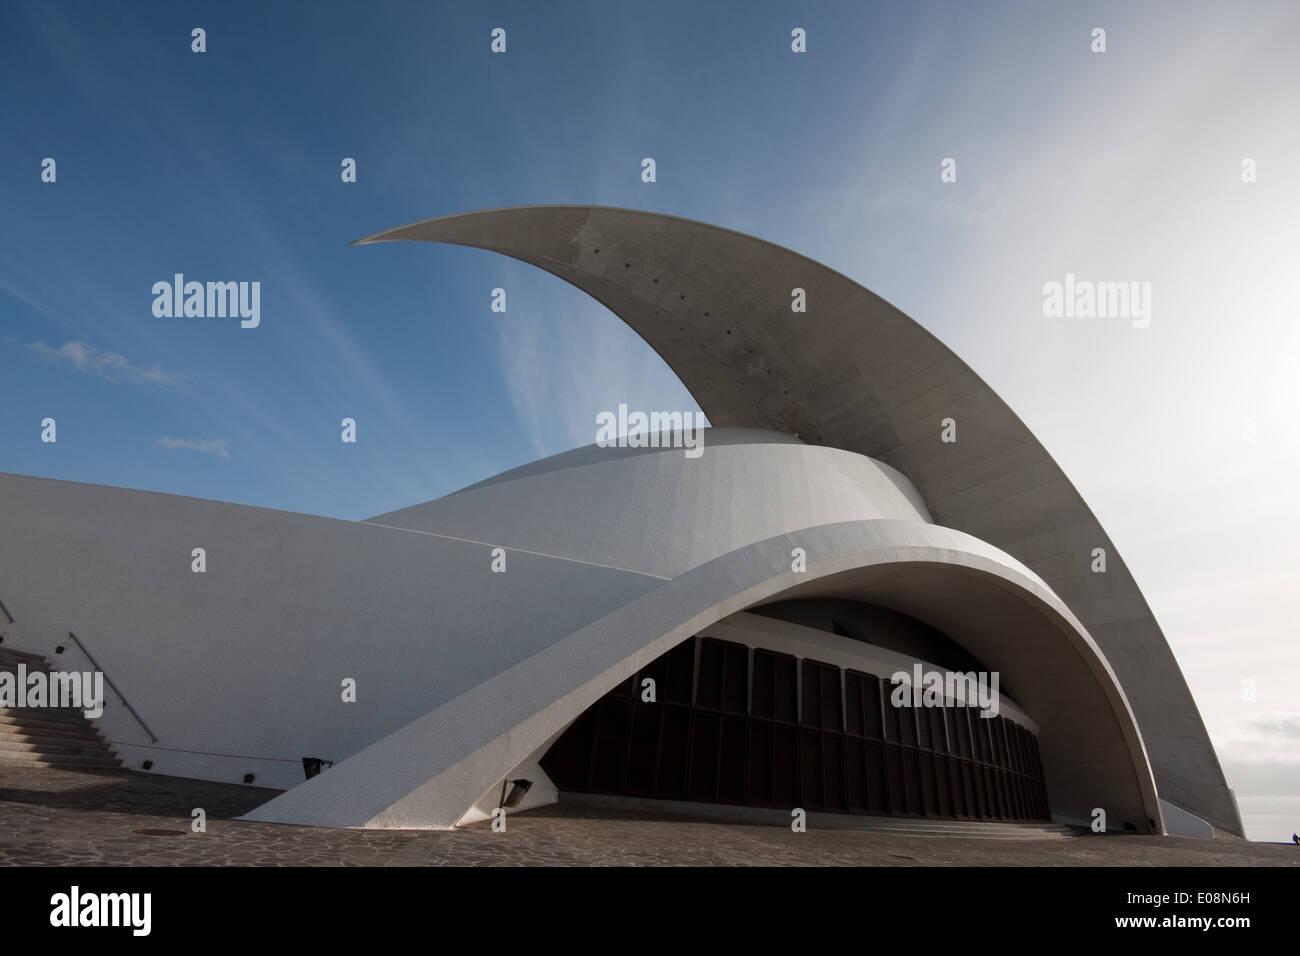 Auditorio de Tenerife, Santa Cruz de Tenerife, Tenerife, Spain - Stock Image